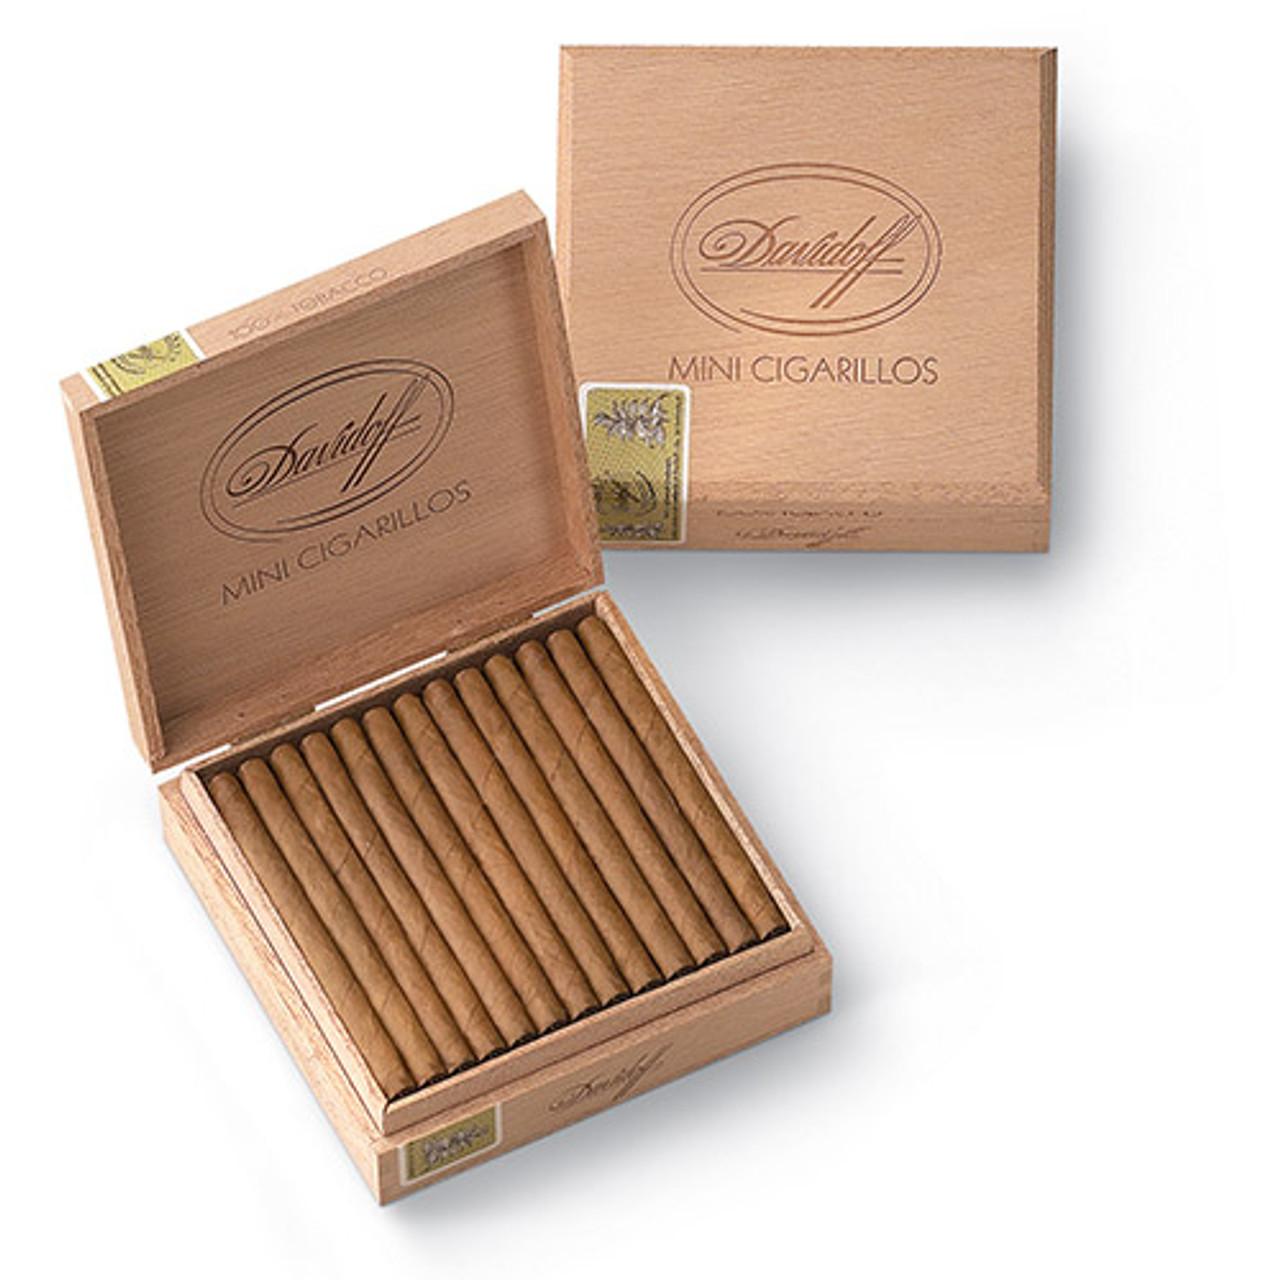 Davidoff Cigarillos and Small Cigars Demi-Tasse Cigars - 4 x 25 (5 Packs of 10 (50 Total))